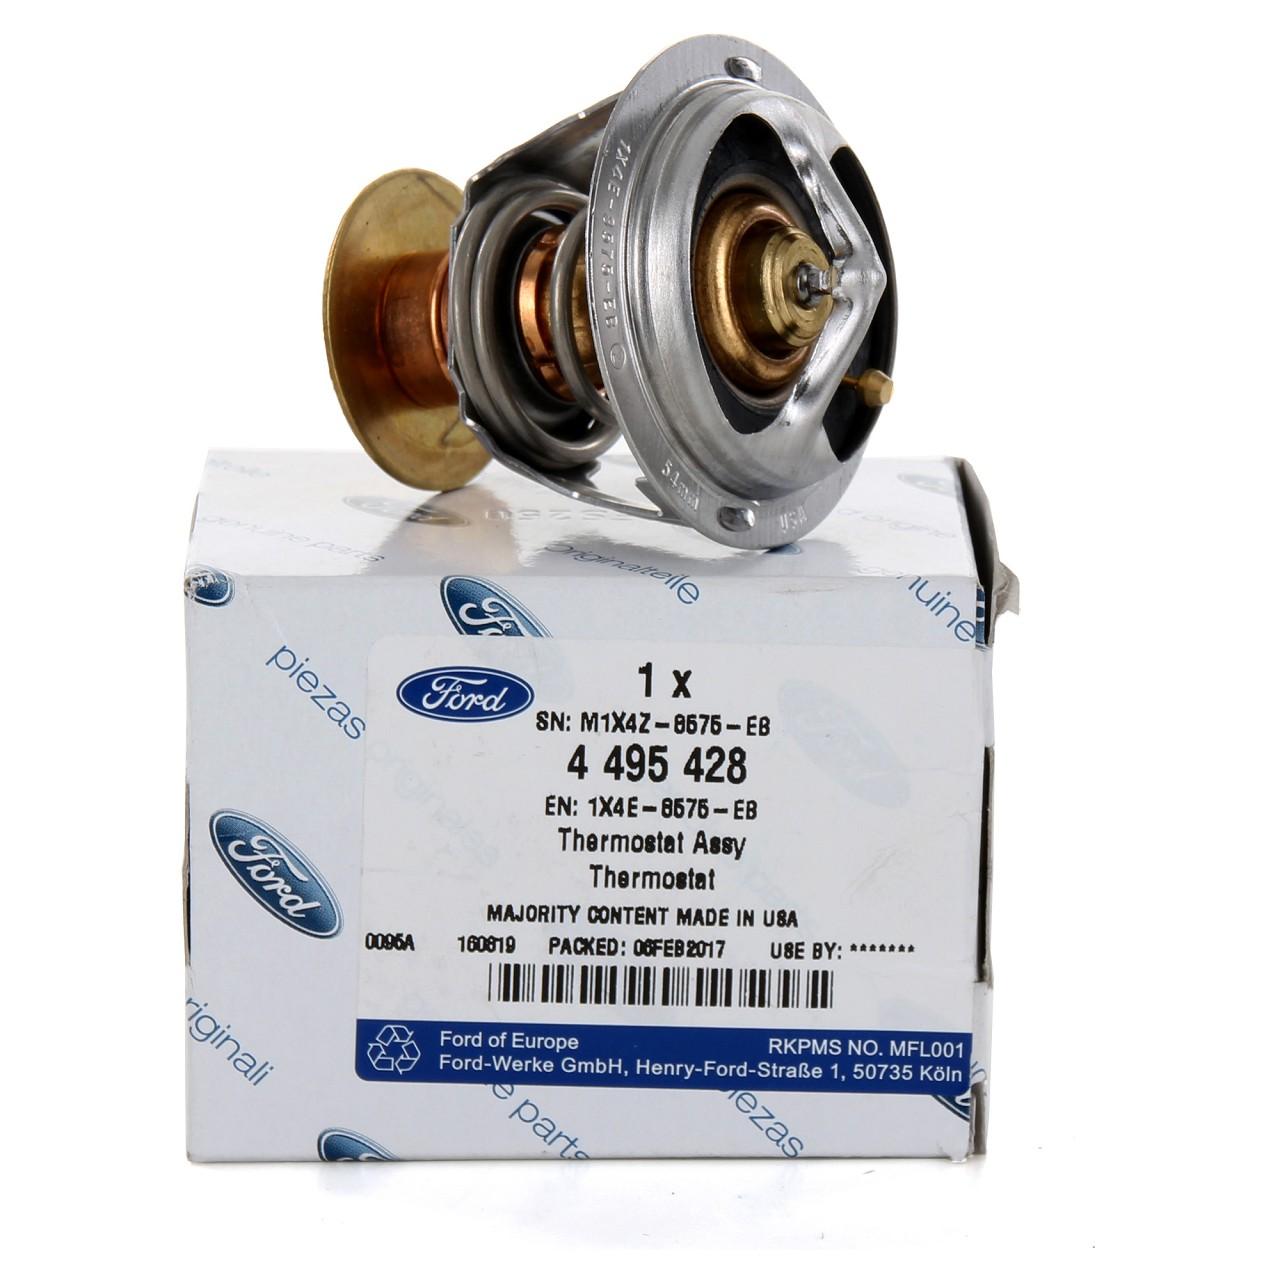 ORIGINAL Ford Thermostat COUGAR MAVERICK MONDEO I II III 2.5/3.0 V6 4495428